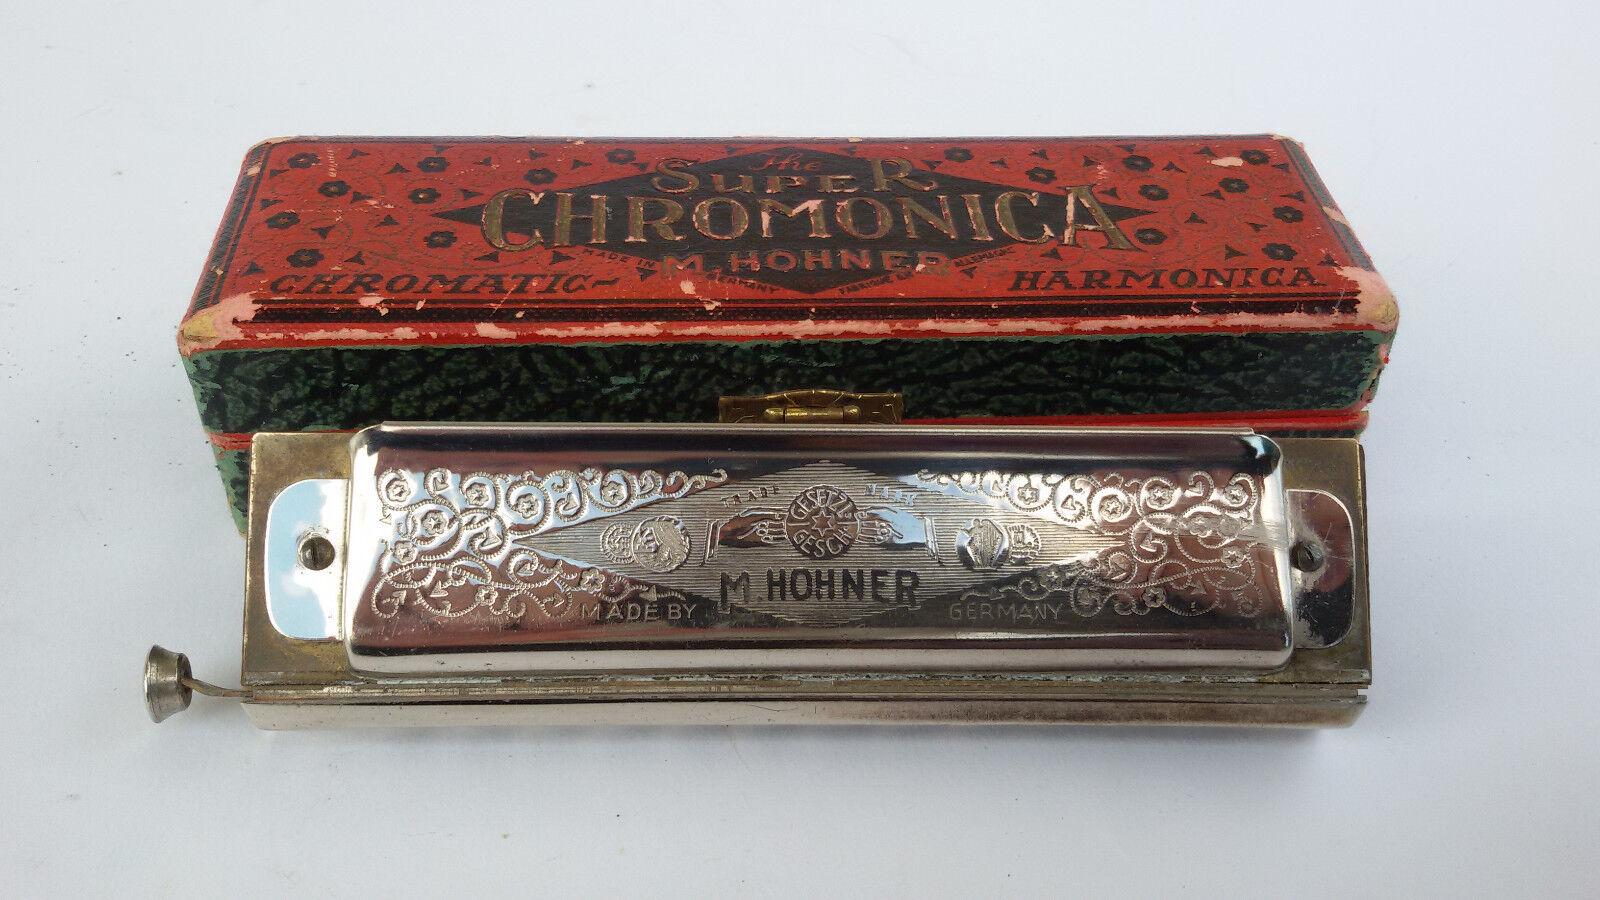 RARE VINTAGE THE SUPER HARMONICA CHROMATIC M.HOHNER + ORIGINAL BOX